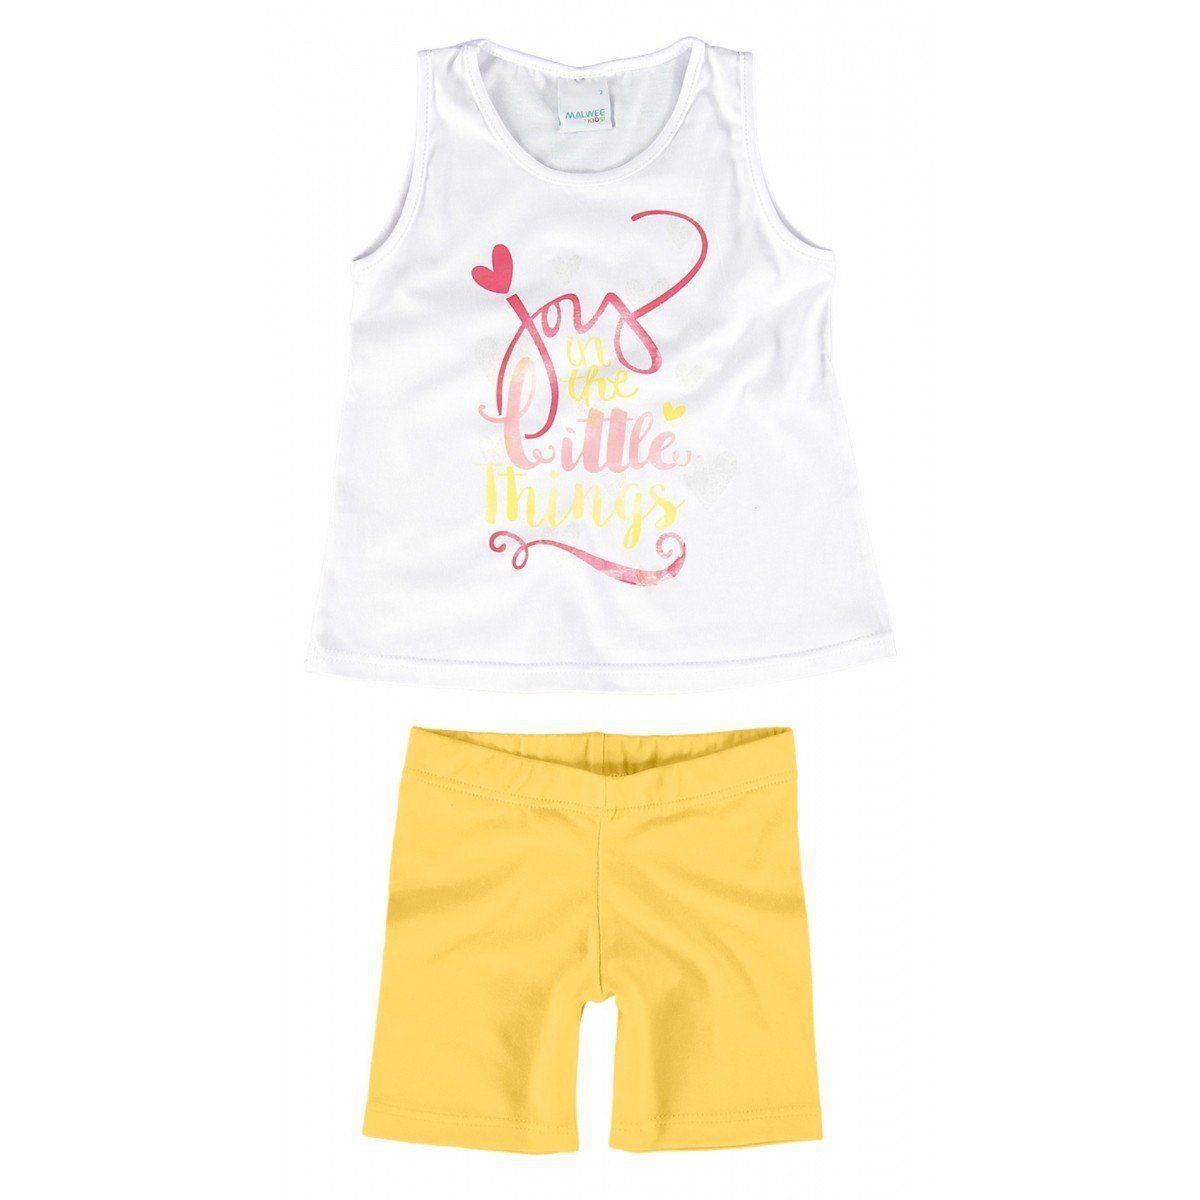 Conjunto Infantil Feminino Branco Little Things Malwee